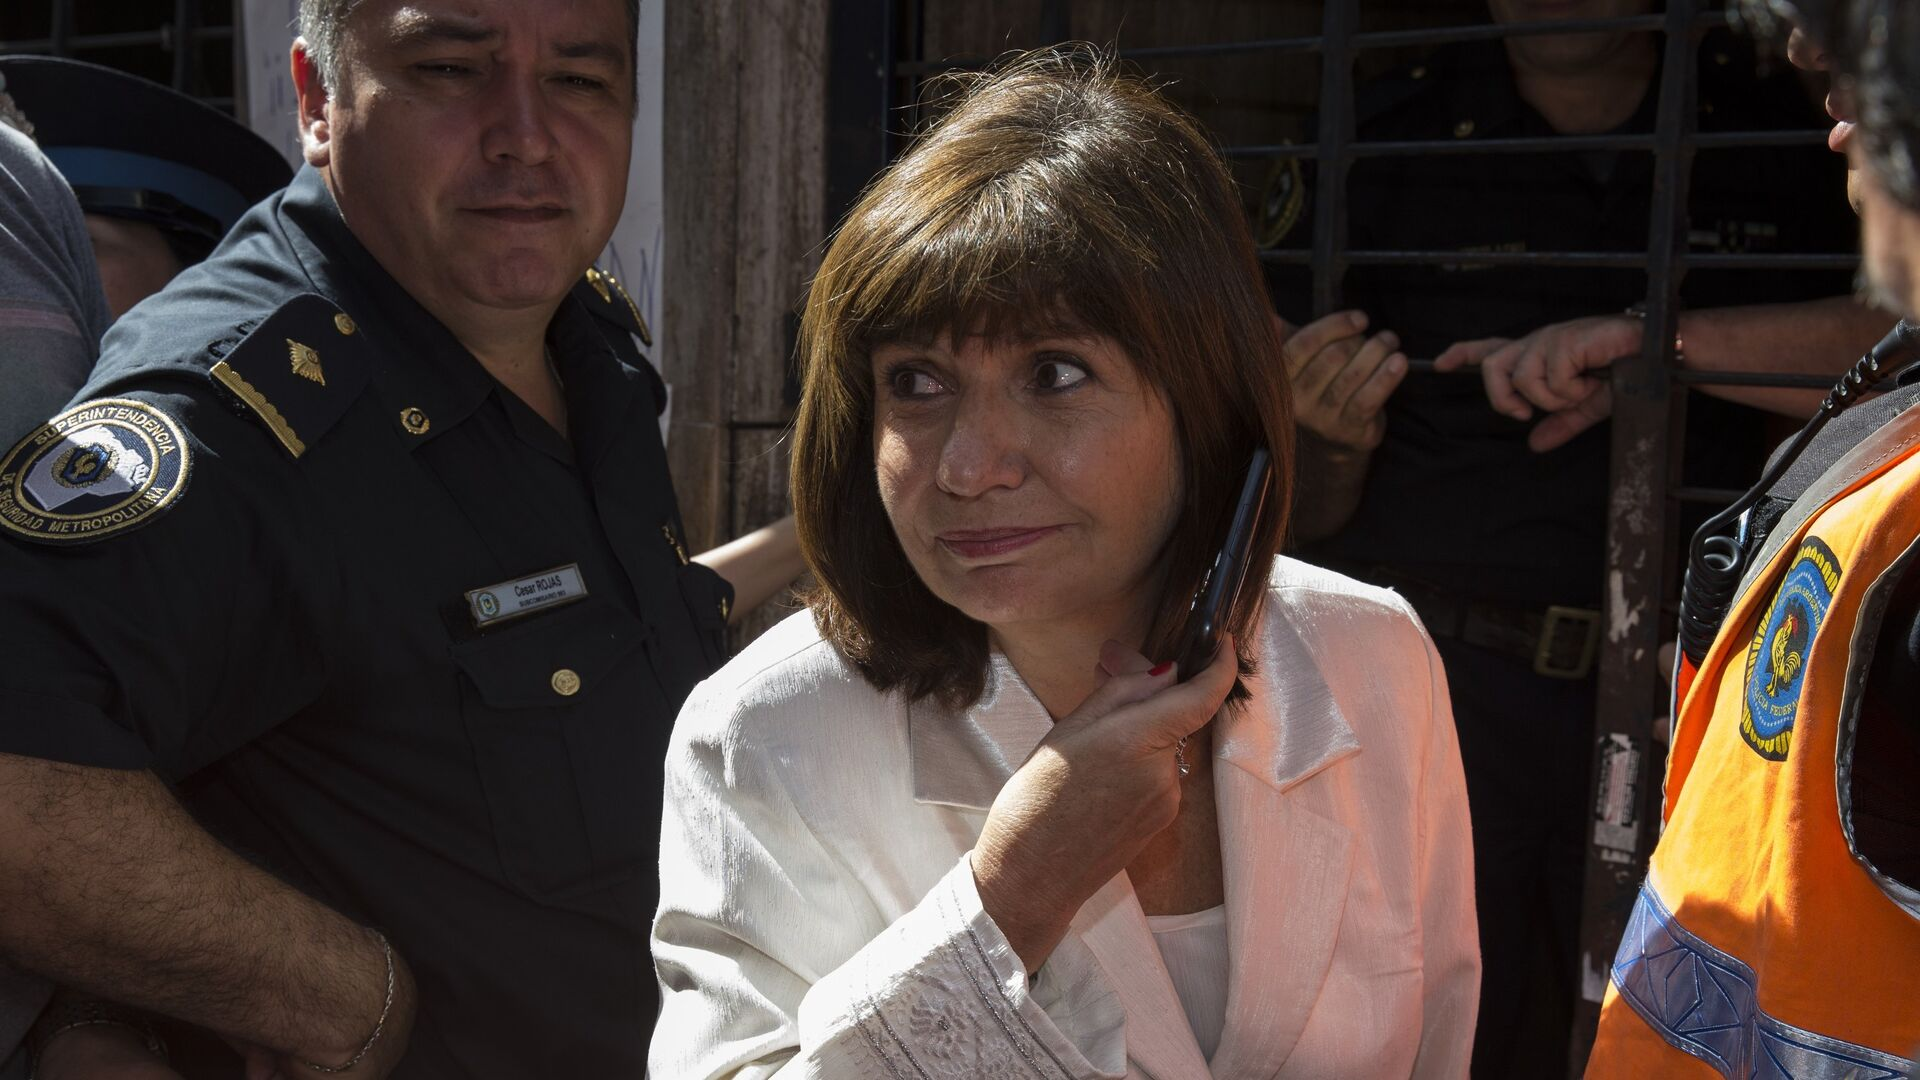 Congresswoman Patricia Bullrich enters the office of prosecutor Viviana Fein, who is investigating special prosecutor Alberto Nisman's death, in Buenos Aires - Sputnik Mundo, 1920, 28.04.2021